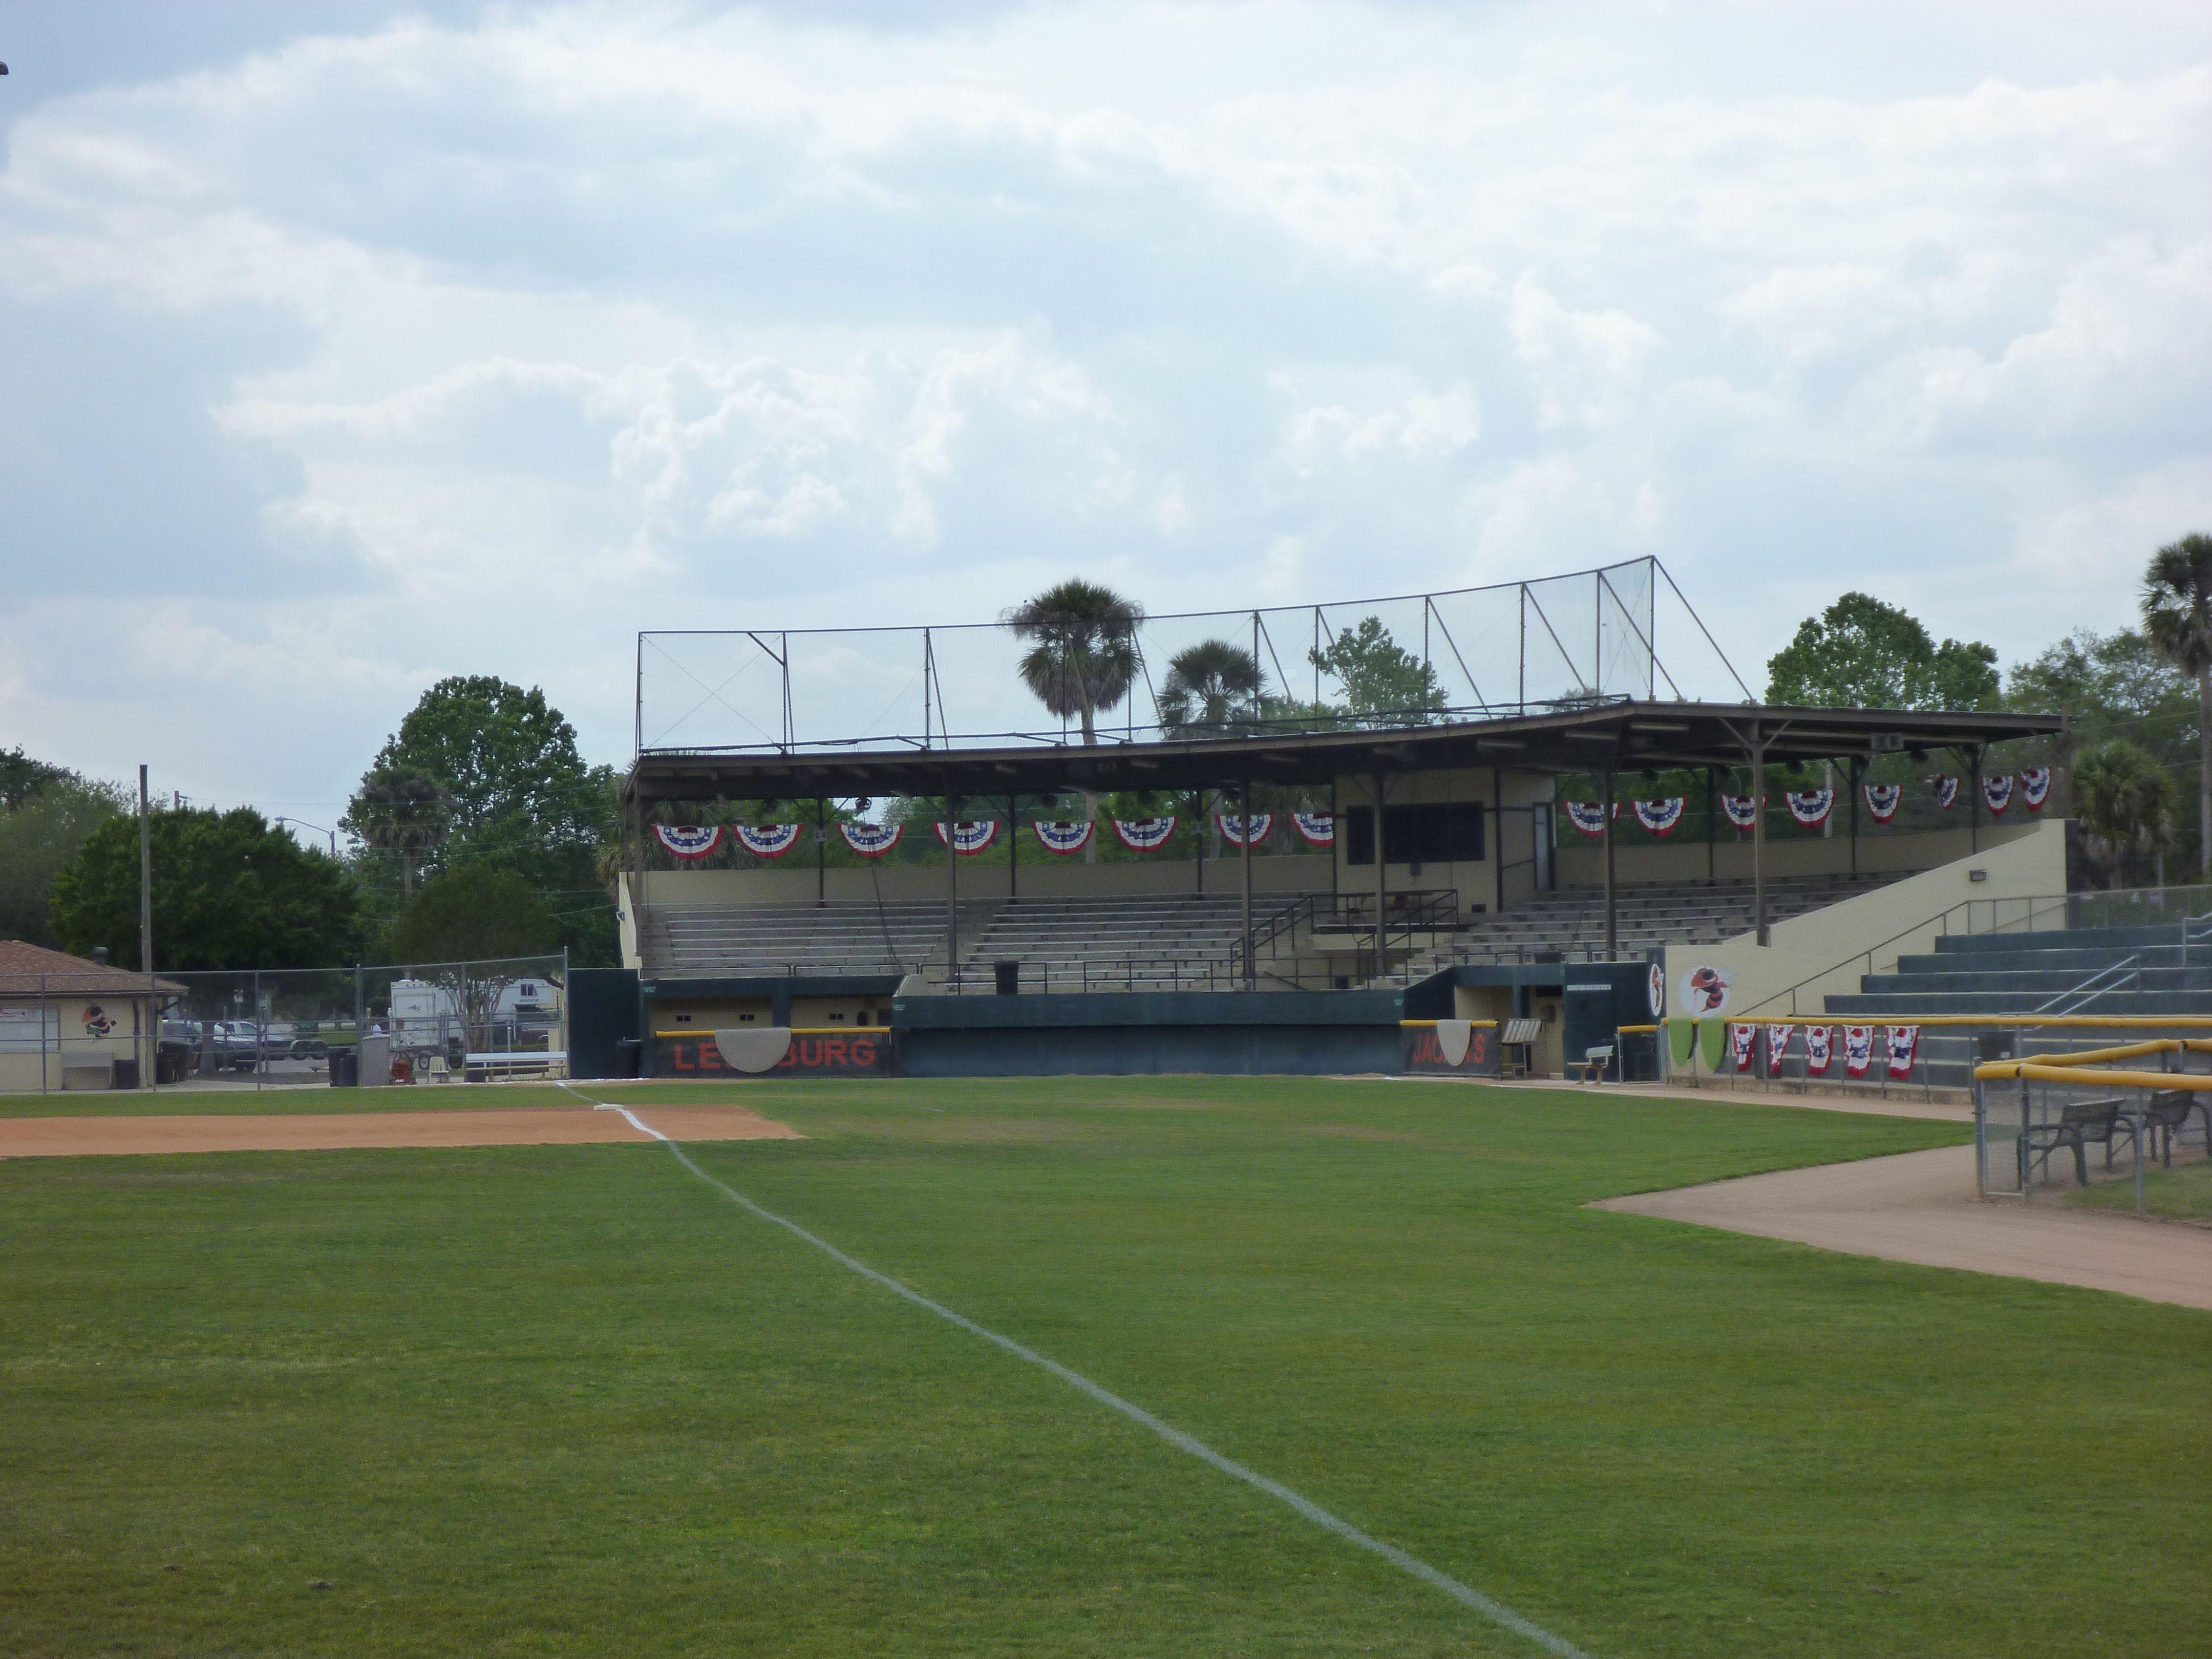 Pat thomas stadium leesburg fl built in 1937 and home